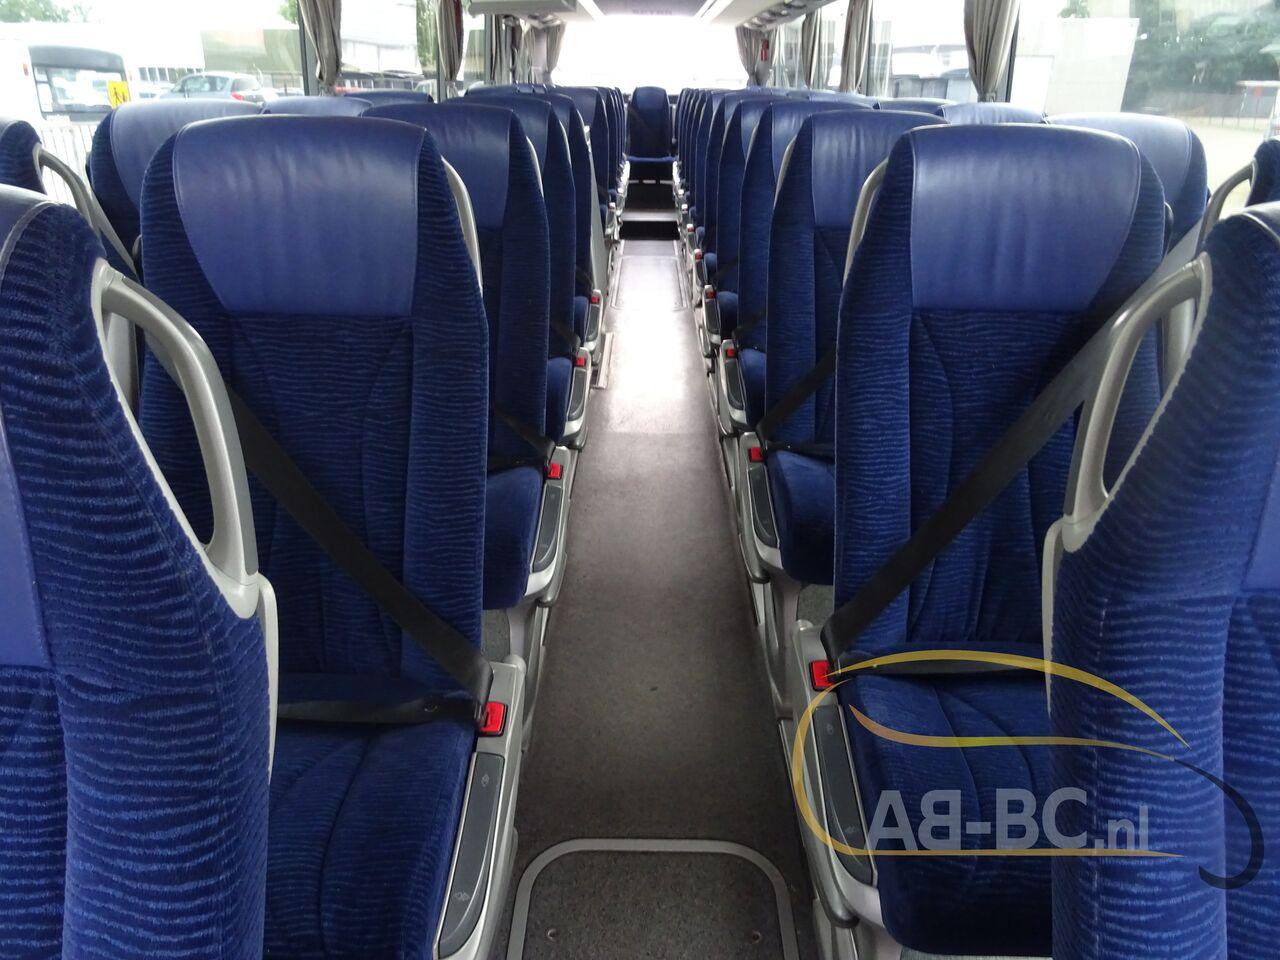 coach-busSETRA-S415-GT-HD-FINAL-EDITION---1627457190041368077_big_19724181bdf11a5850f8ff7a100e79e2--21050713010665719300